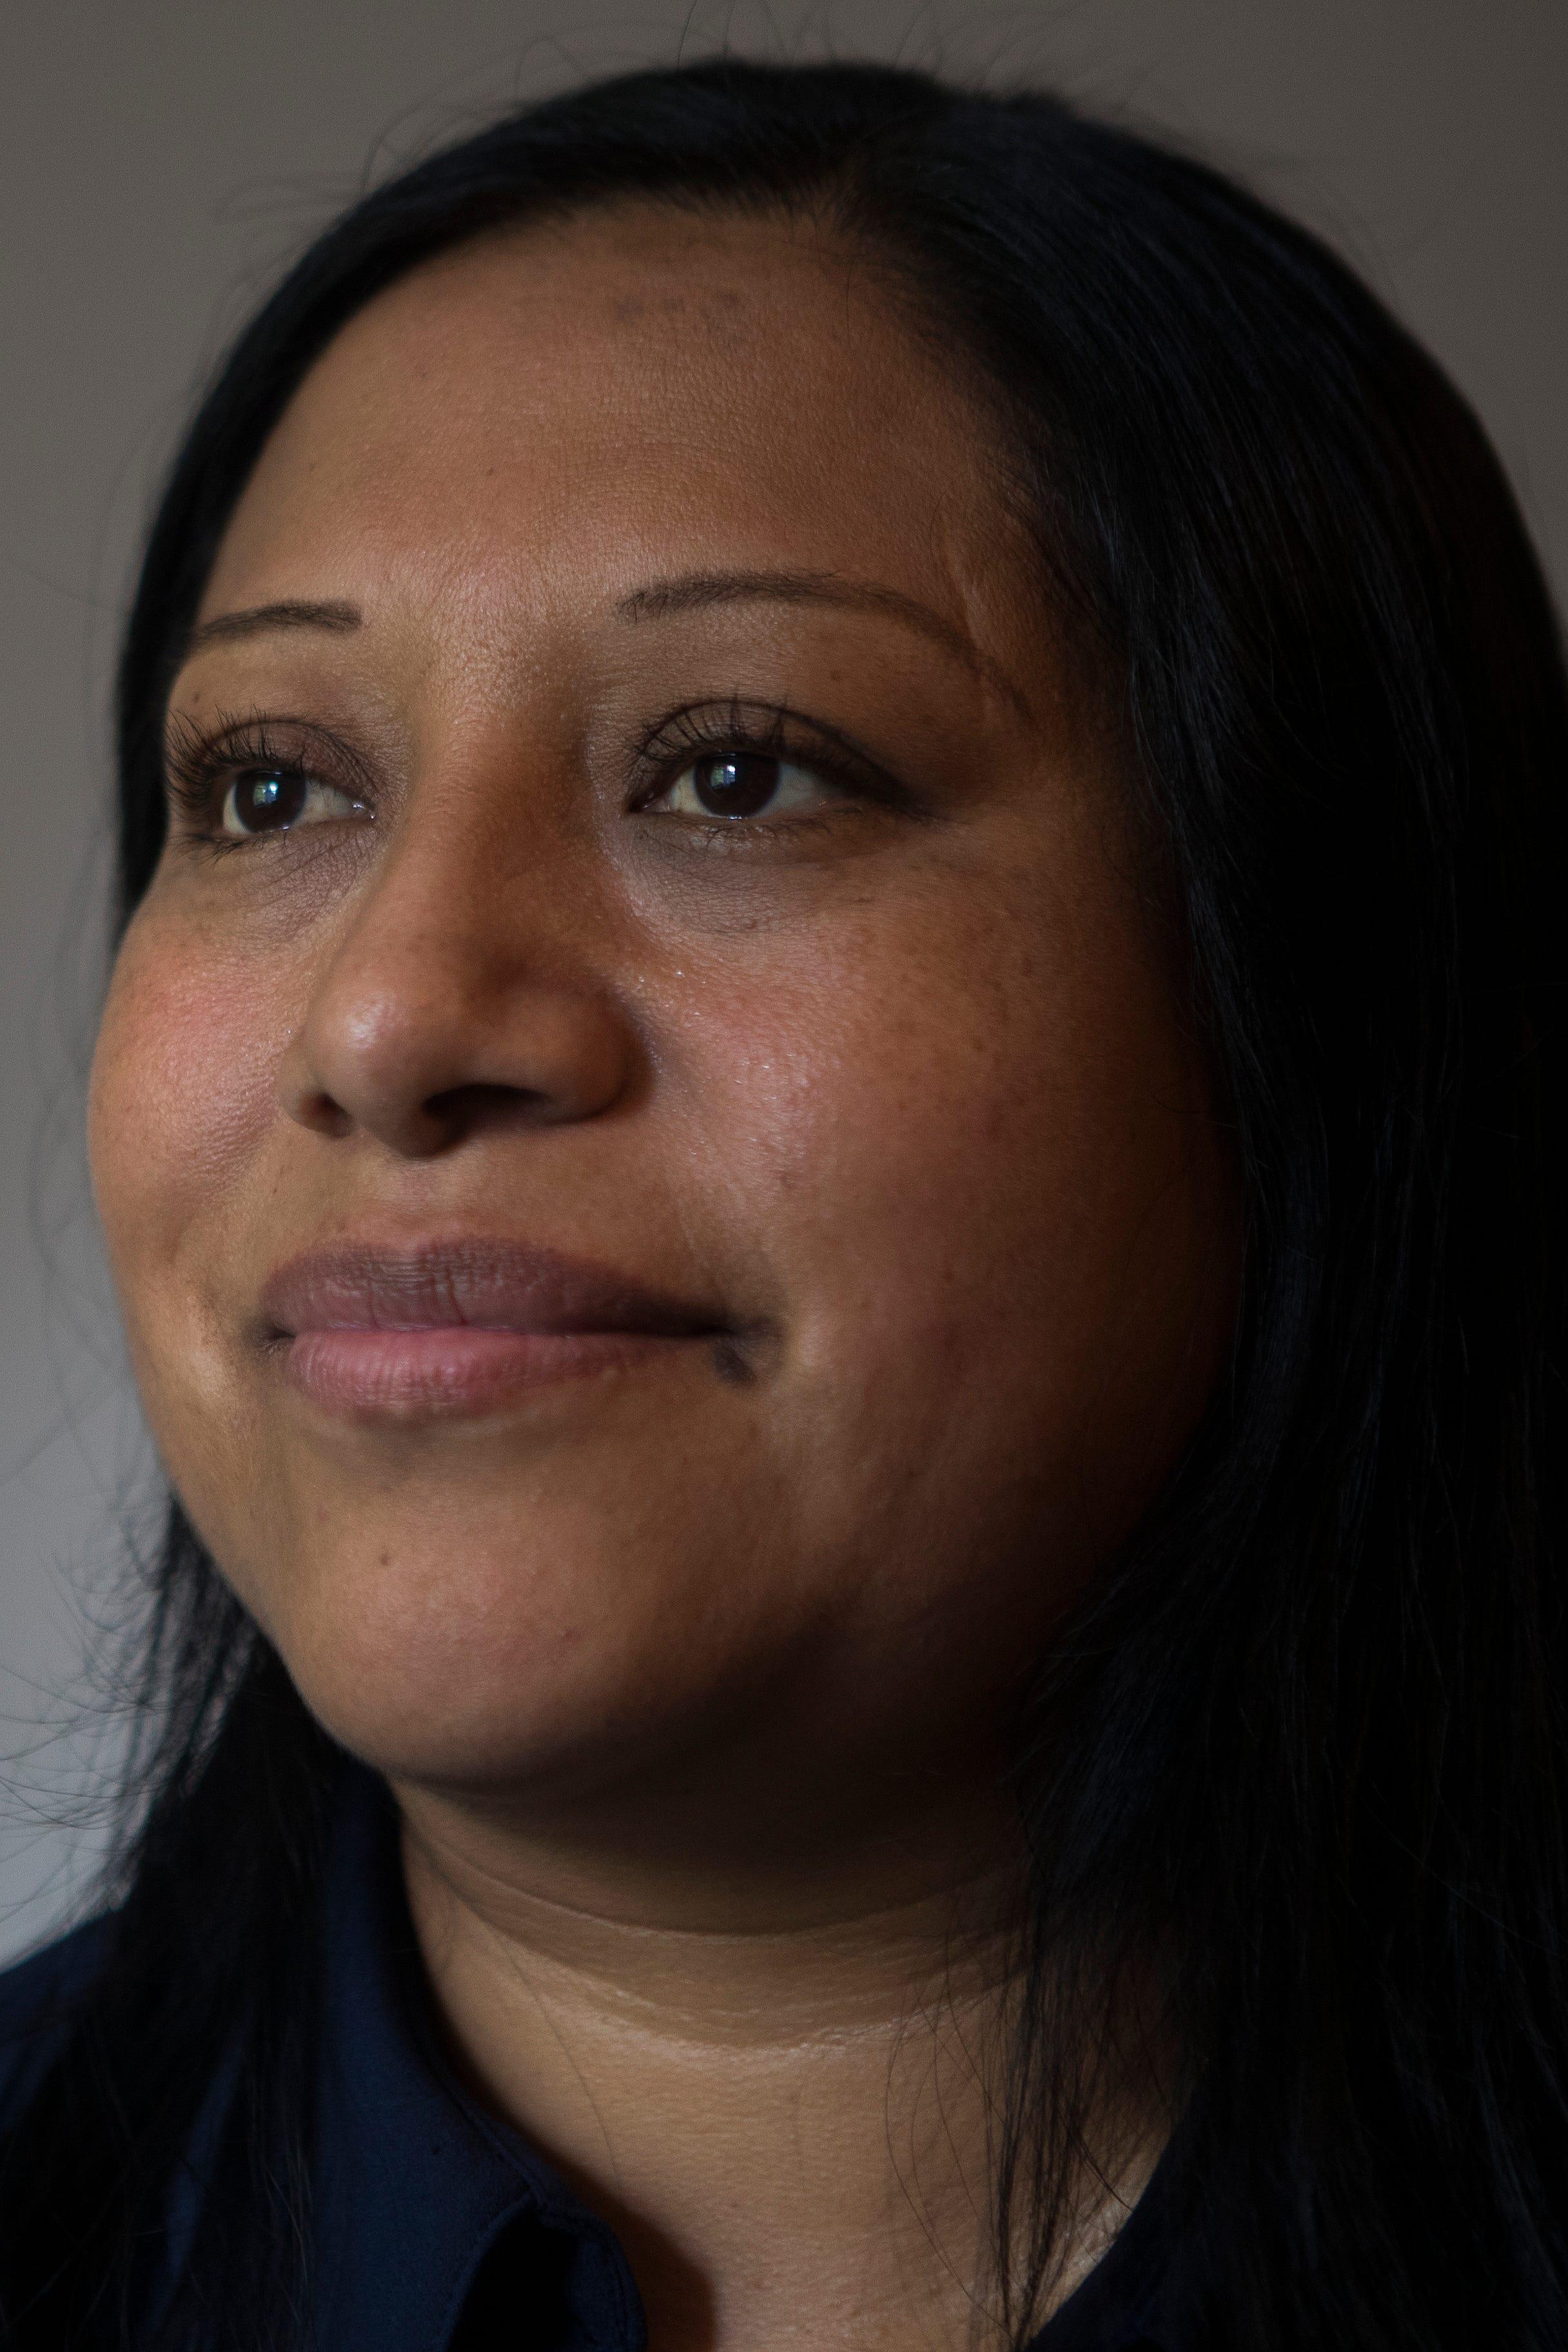 Lizbeth Reyes, 42, Wilmington resident